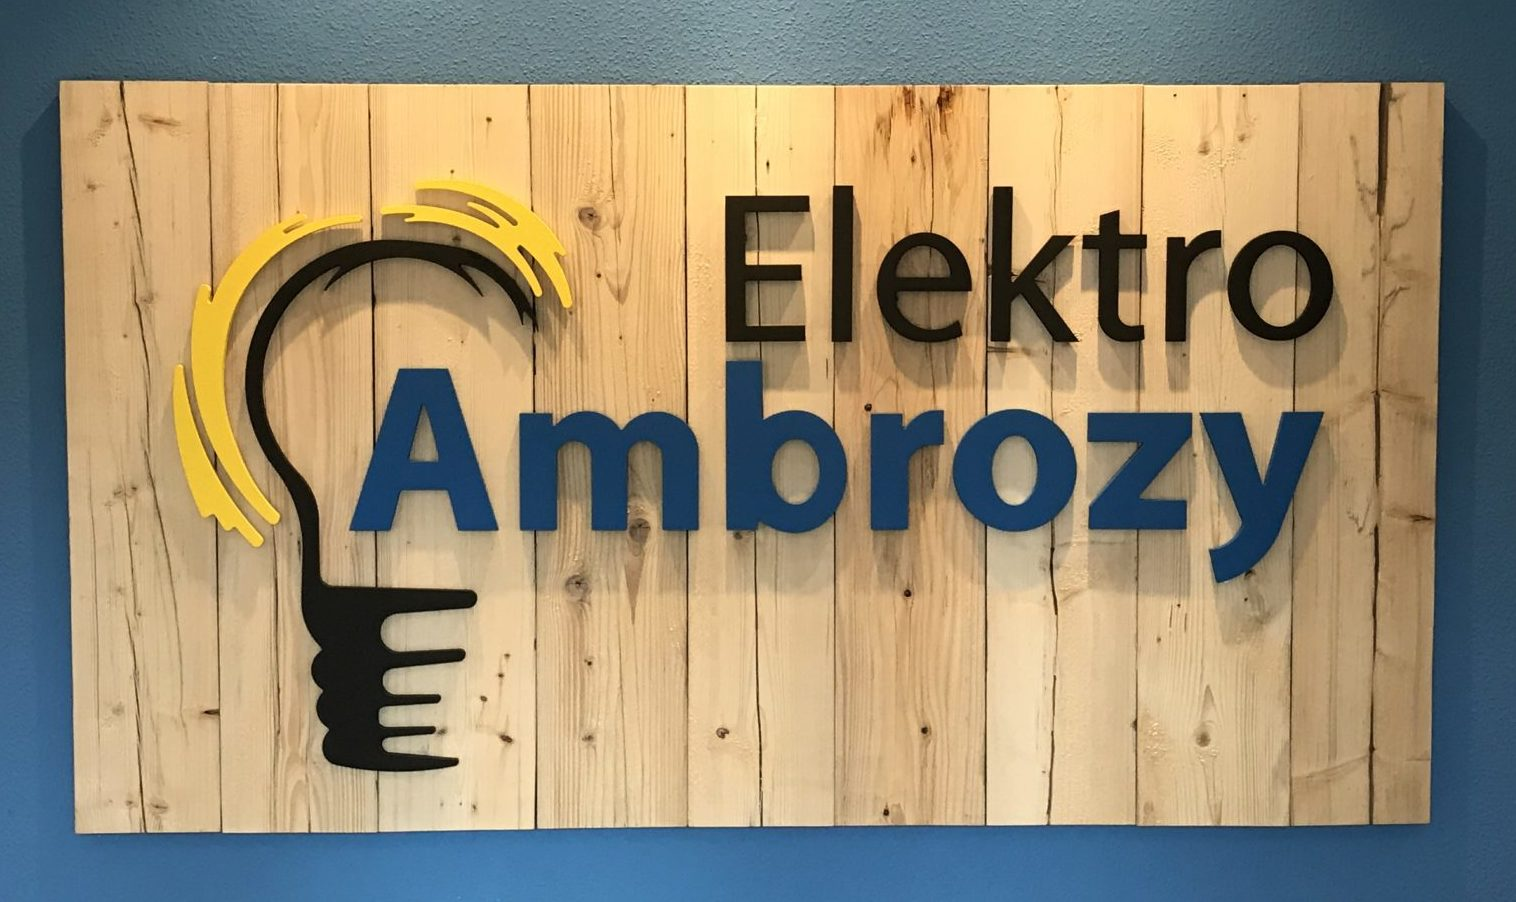 Elektro Ambrozy GmbH